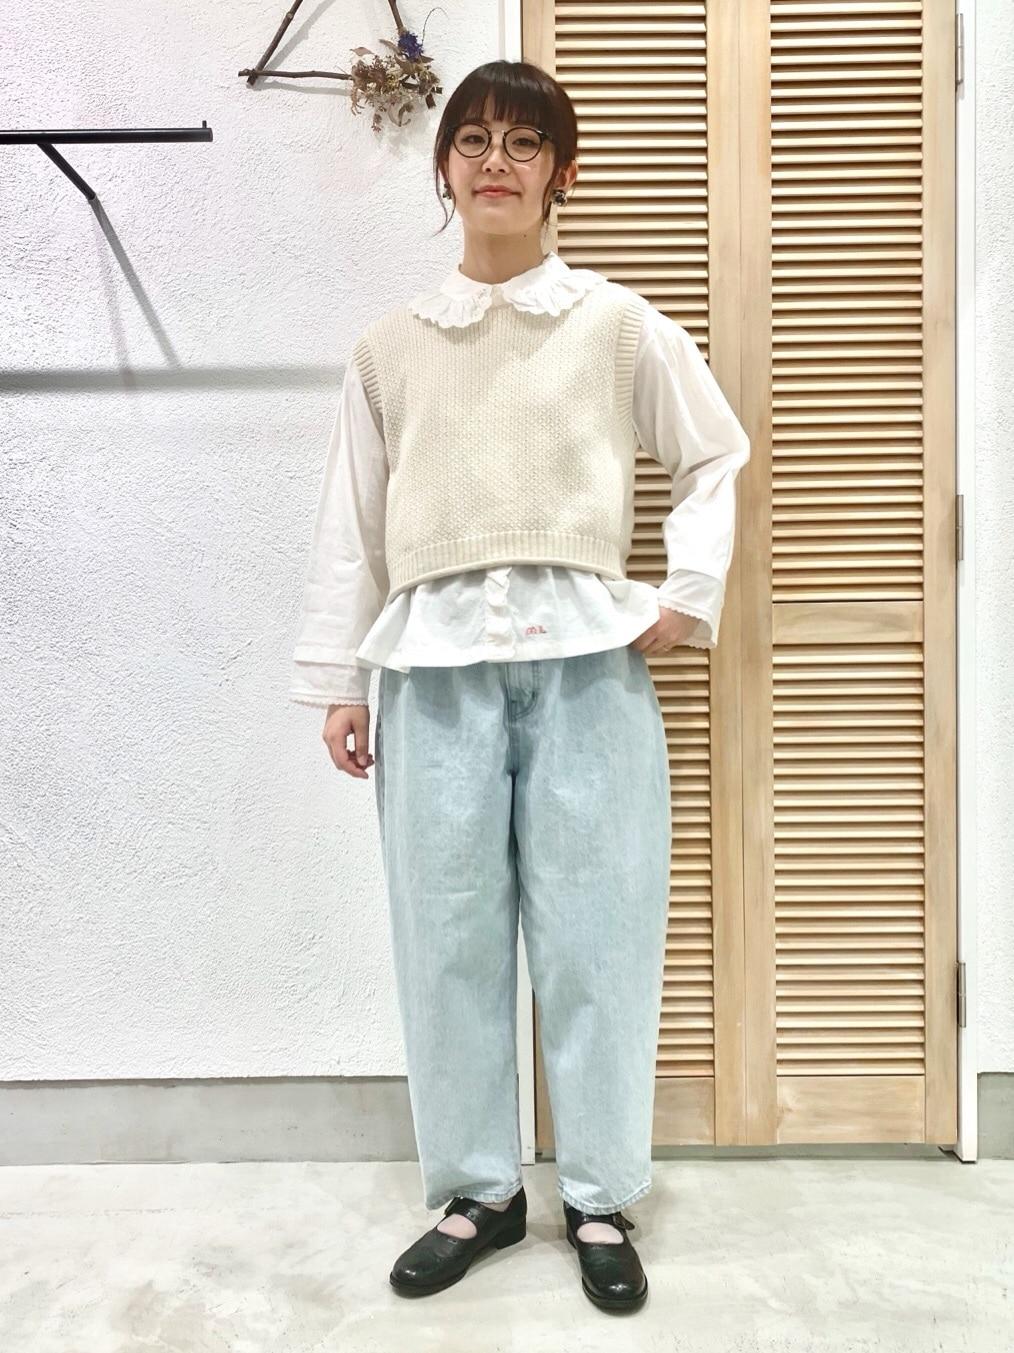 chambre de charme 横浜ジョイナス 身長:162cm 2021.02.24